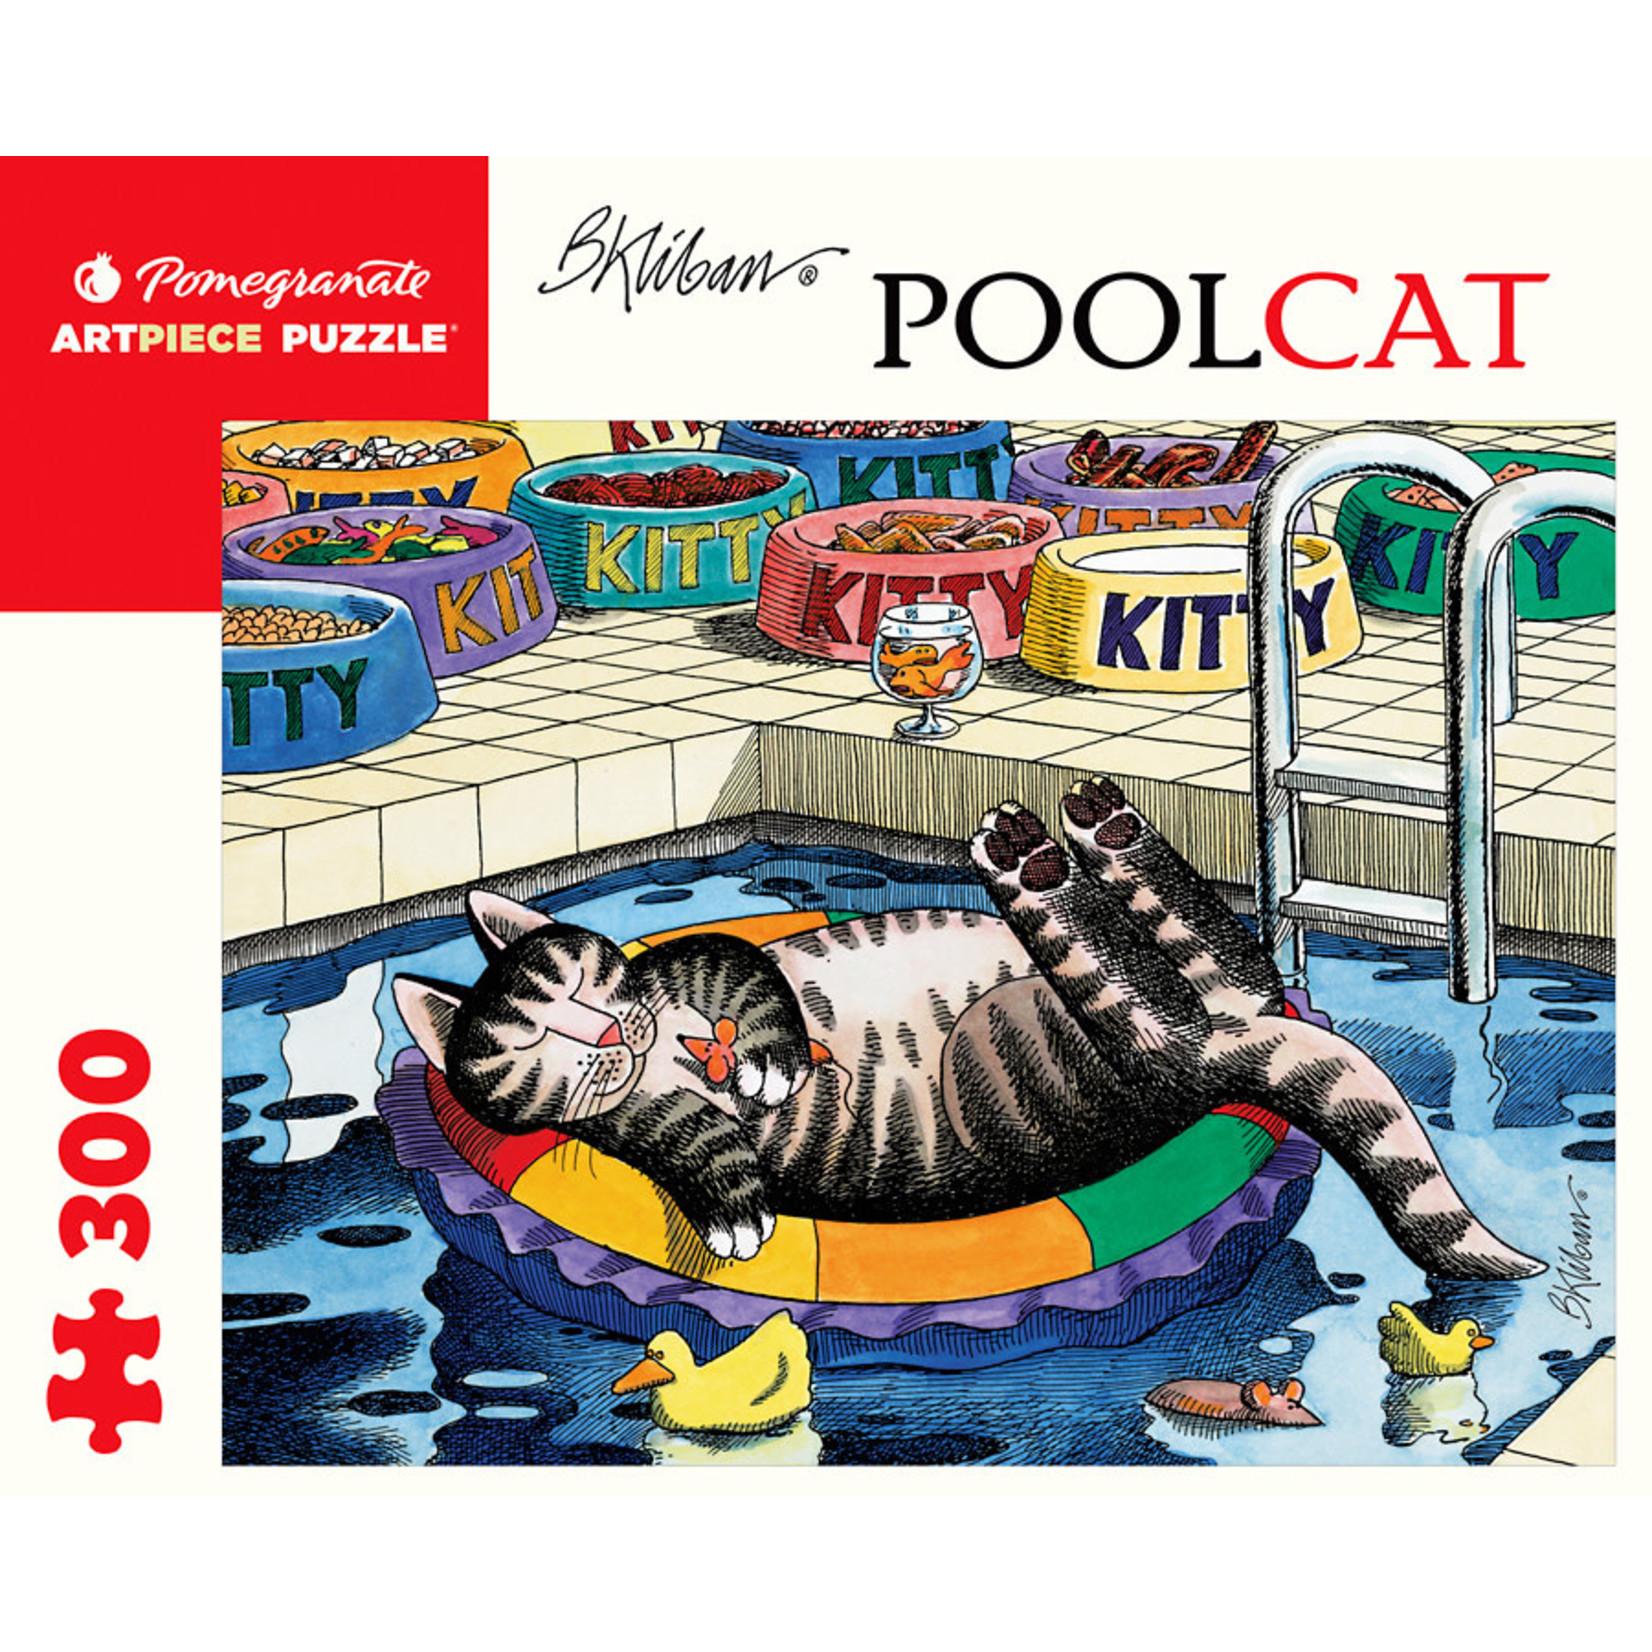 Pomegranate Pomegranate - 300 Piece Puzzle: PoolCat - B. Kliban